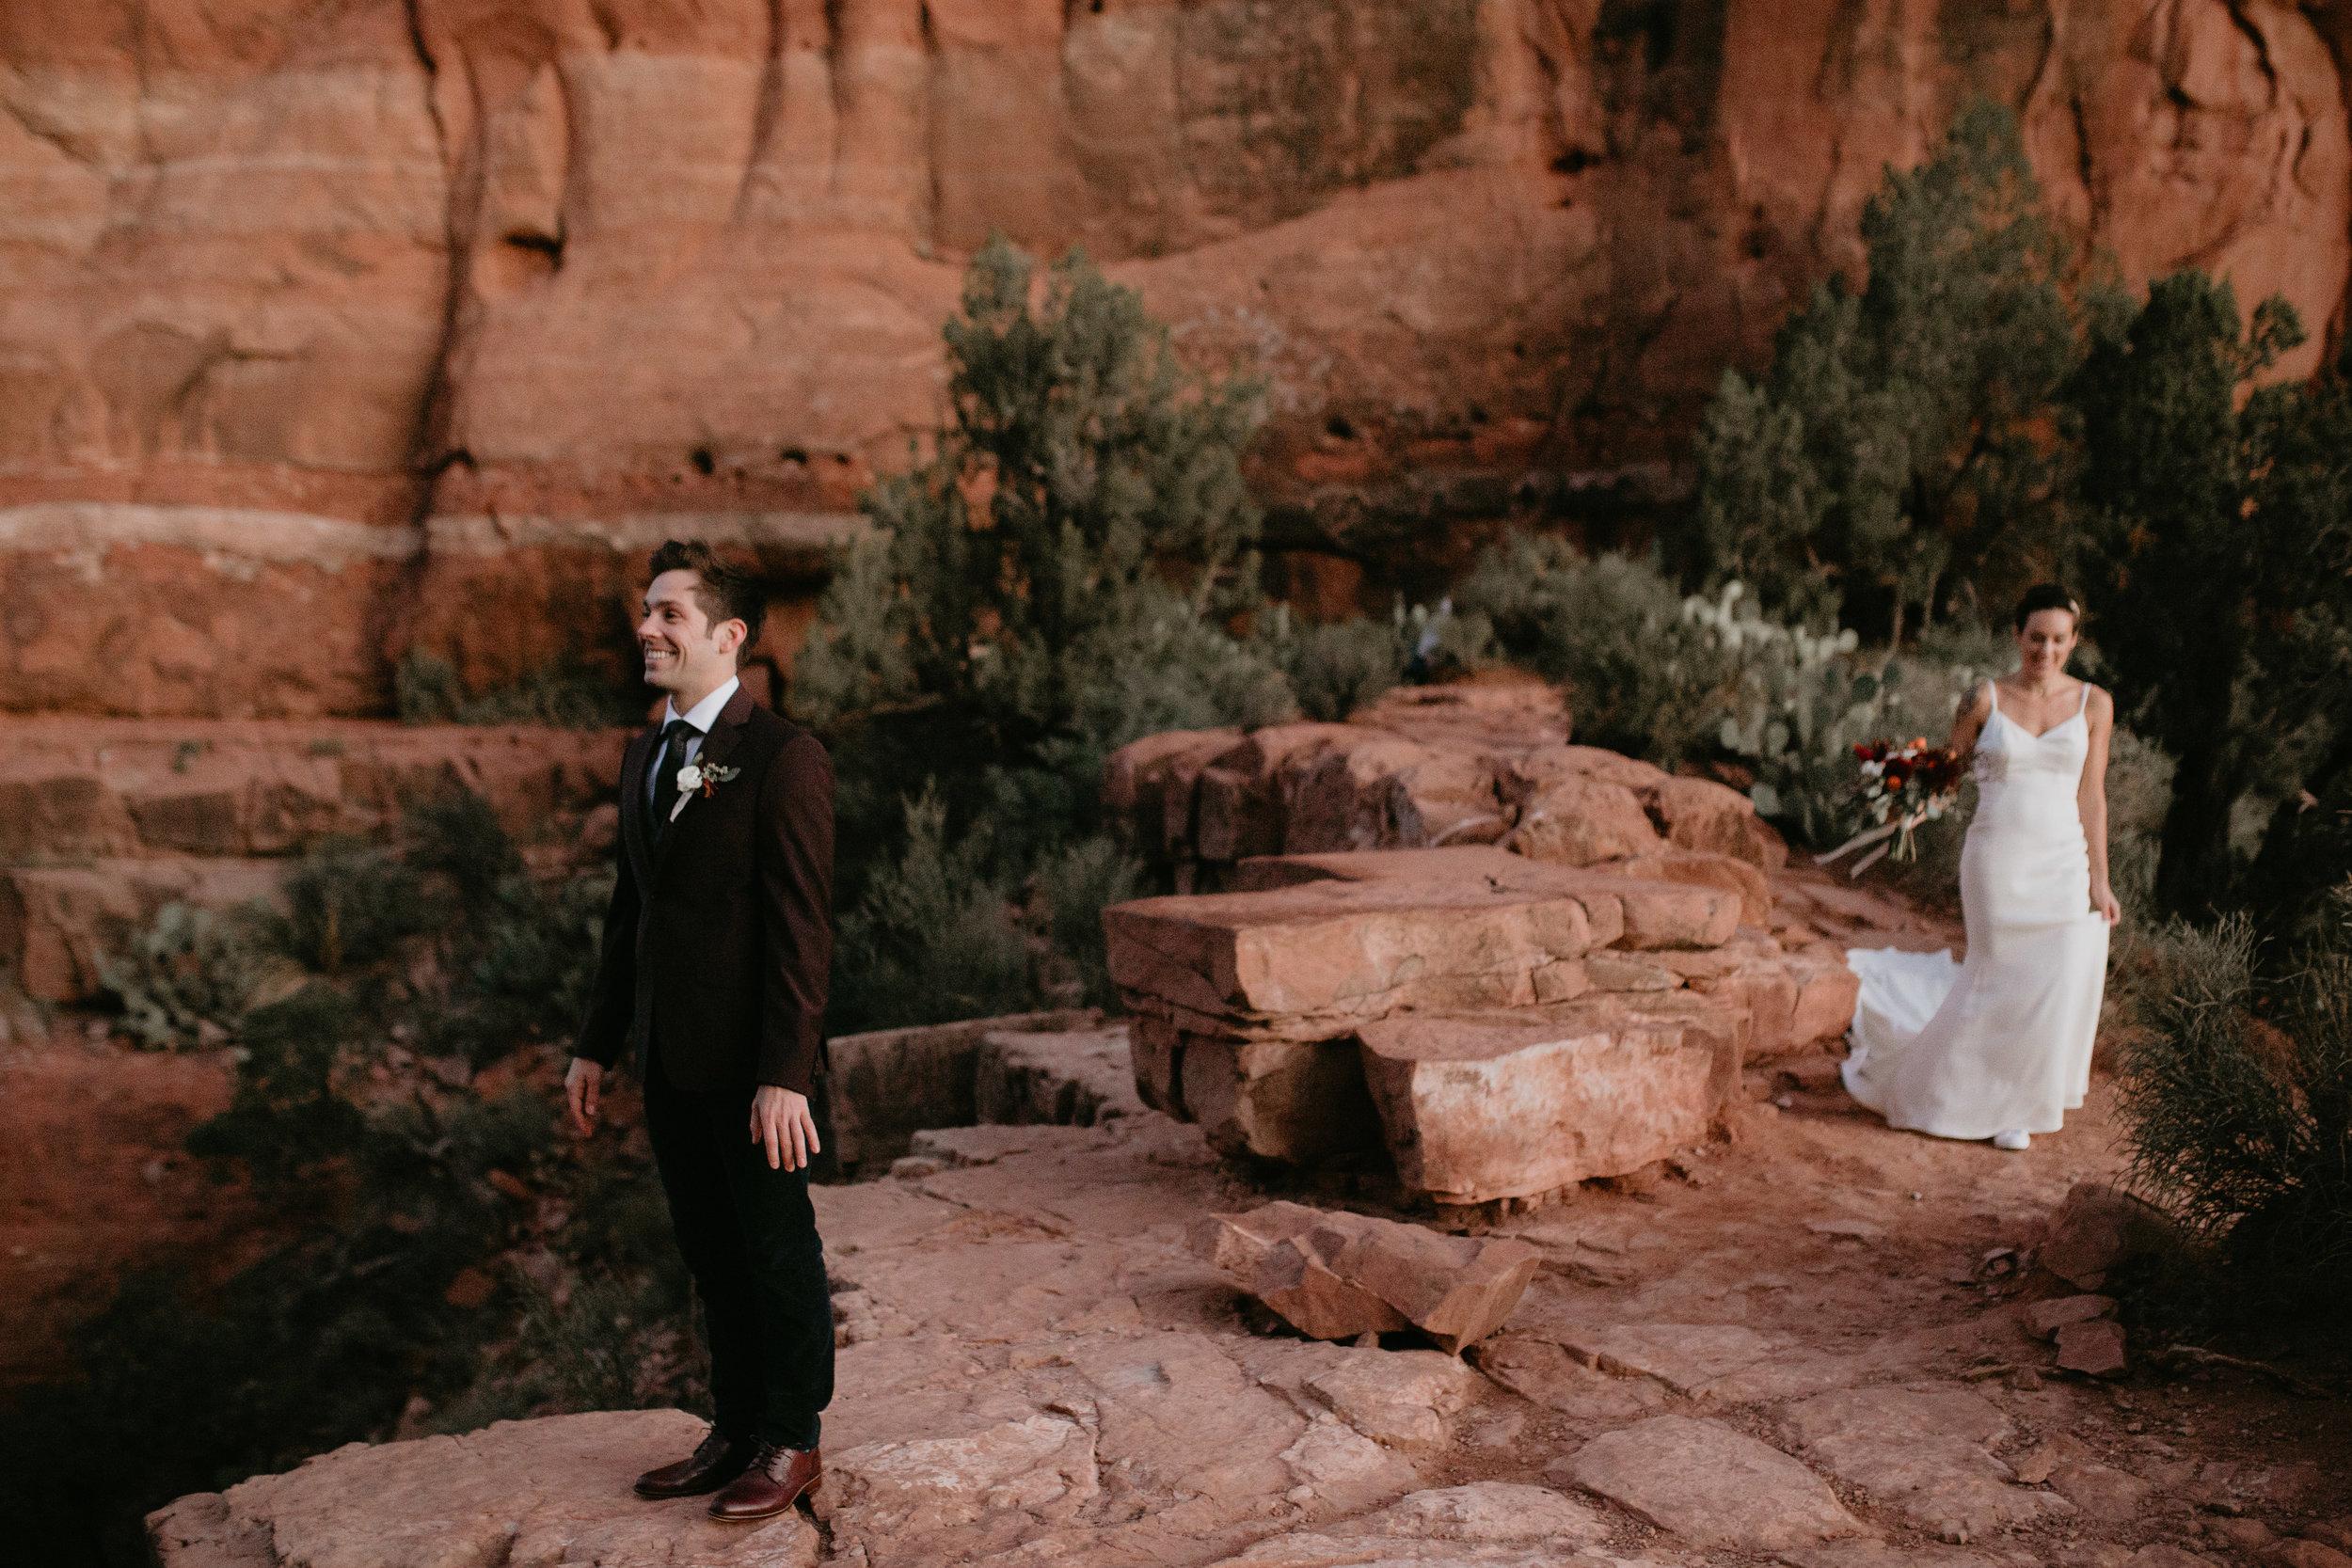 nicole-daacke-photography-sedona-arizona-destination-elopement-wedding-photographer-catherdral-rock-hiking-elopement-sedona-river-elopement-photos-desert-rock-wedding-photographer-laid-back-spontaneous-elopement-4.jpg